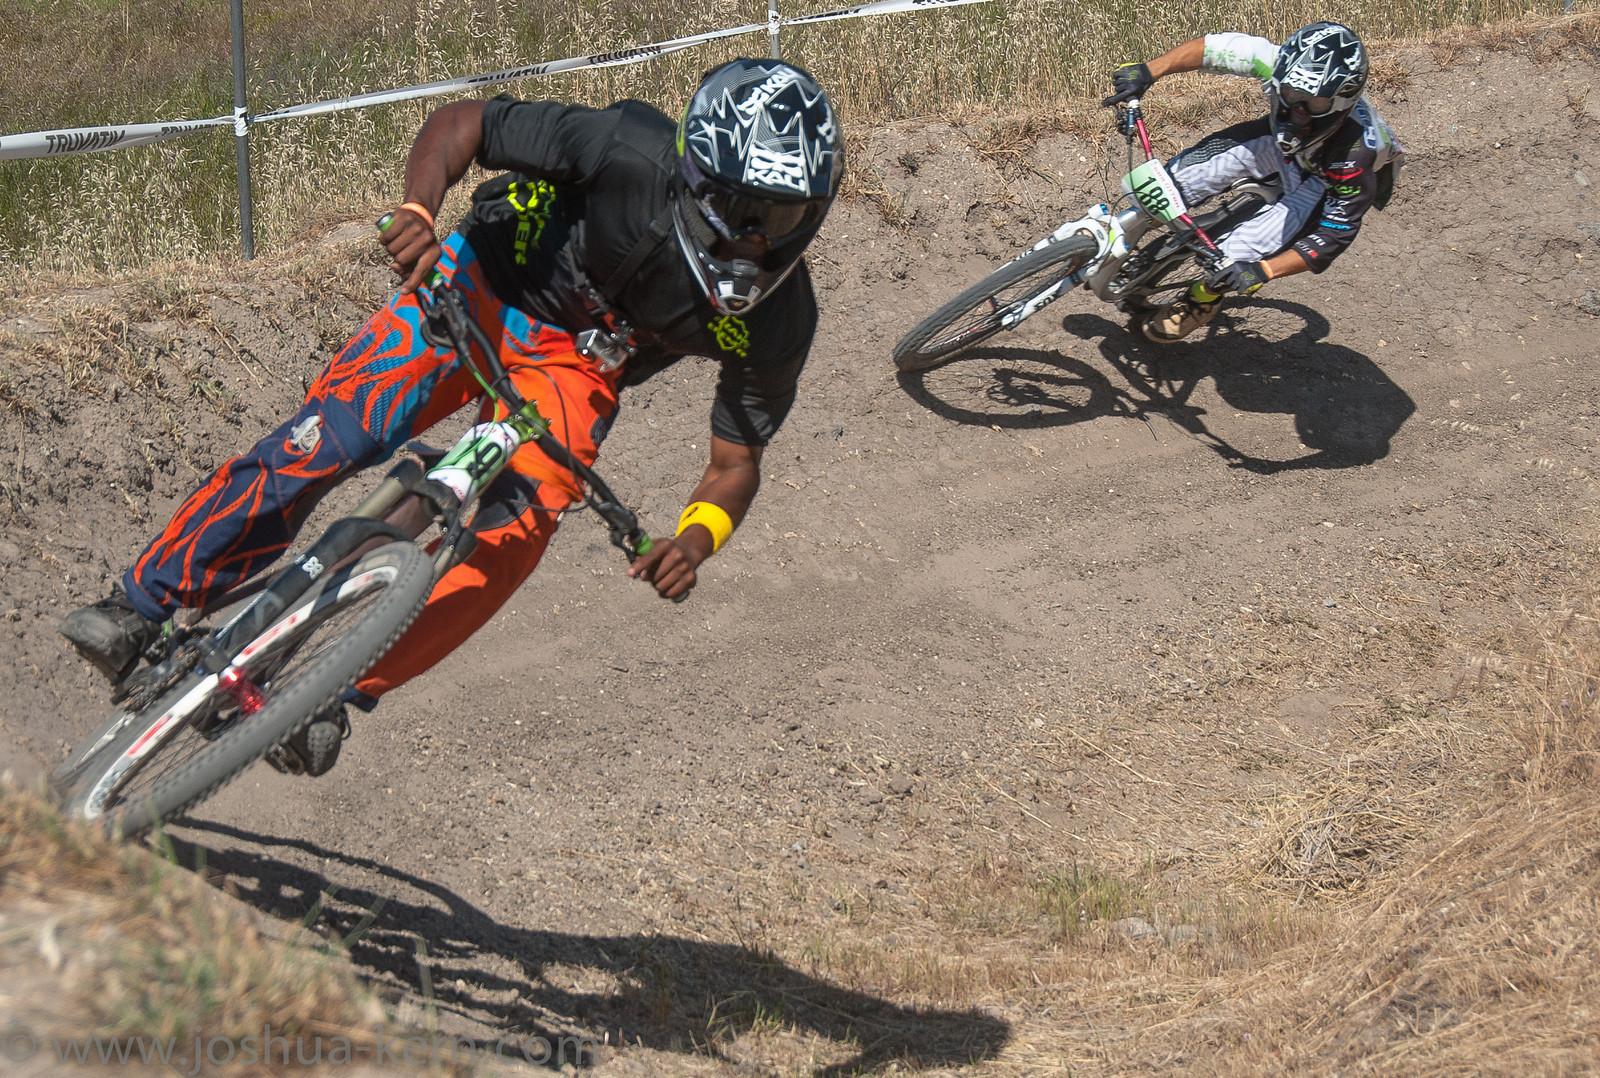 4-19-13DHPractice (30 of 36) - jkern620 - Mountain Biking Pictures - Vital MTB